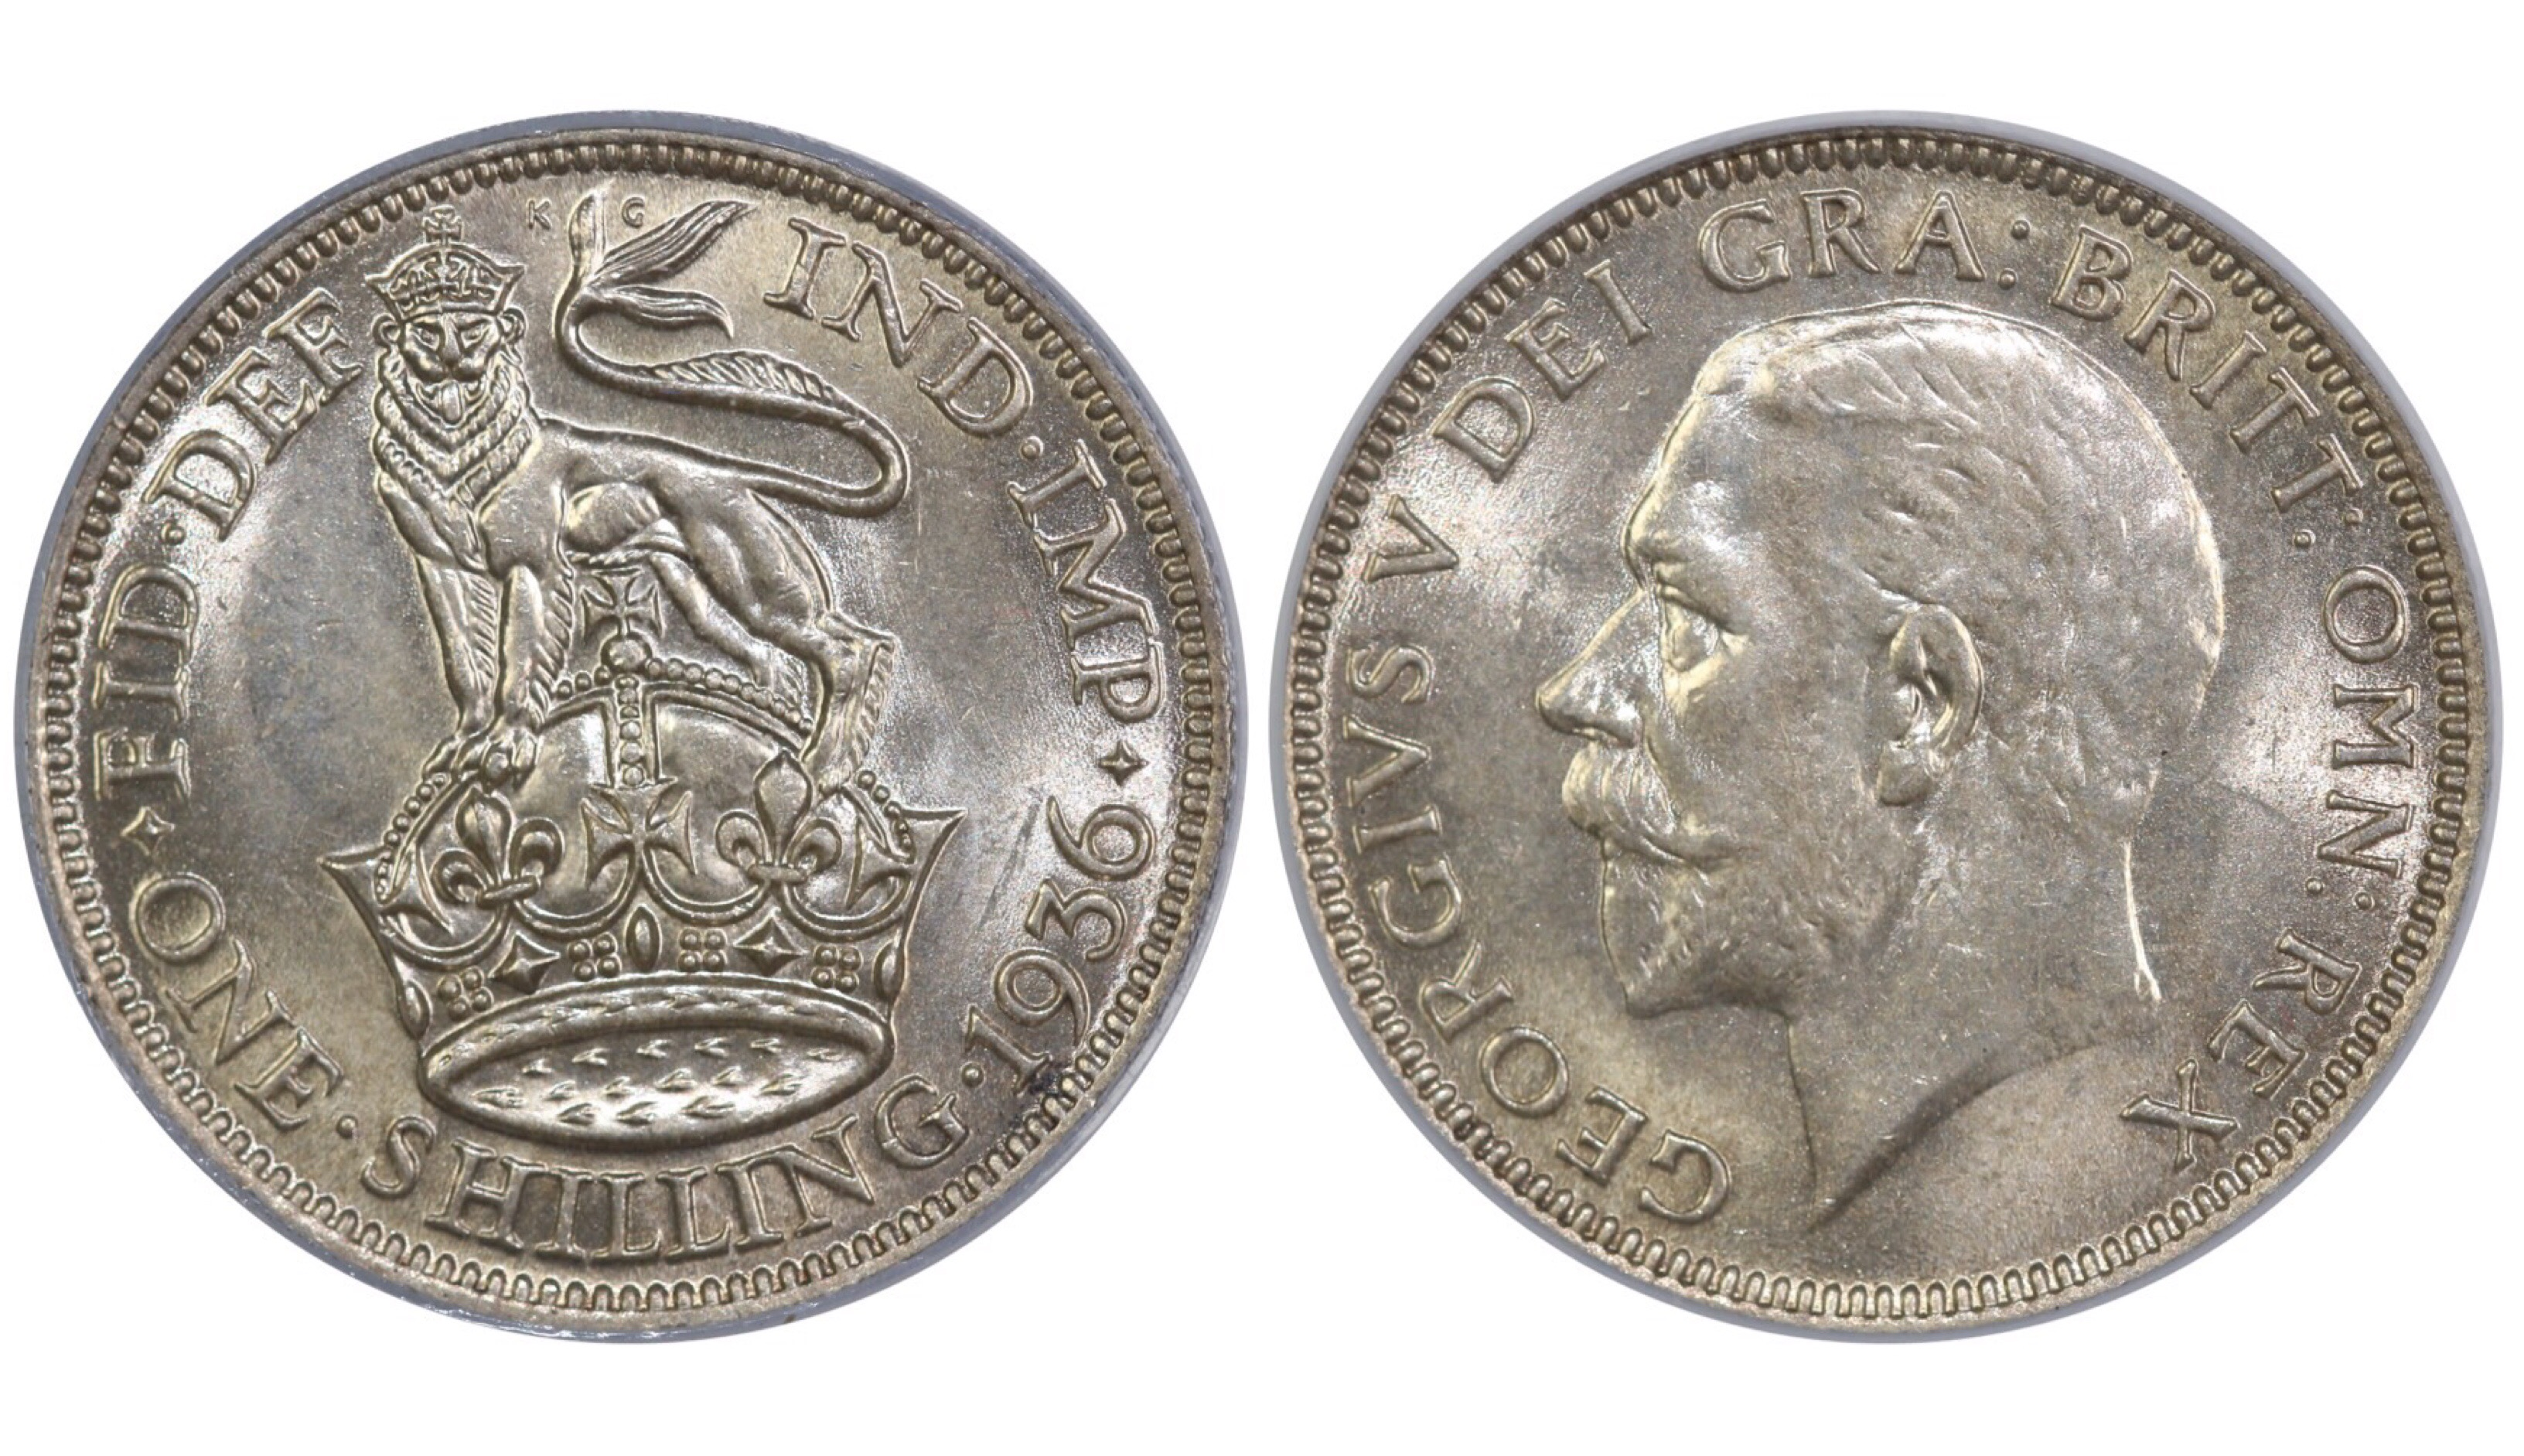 1936 Shilling, CGS 78, George V, ESC 1449, UIN 25659